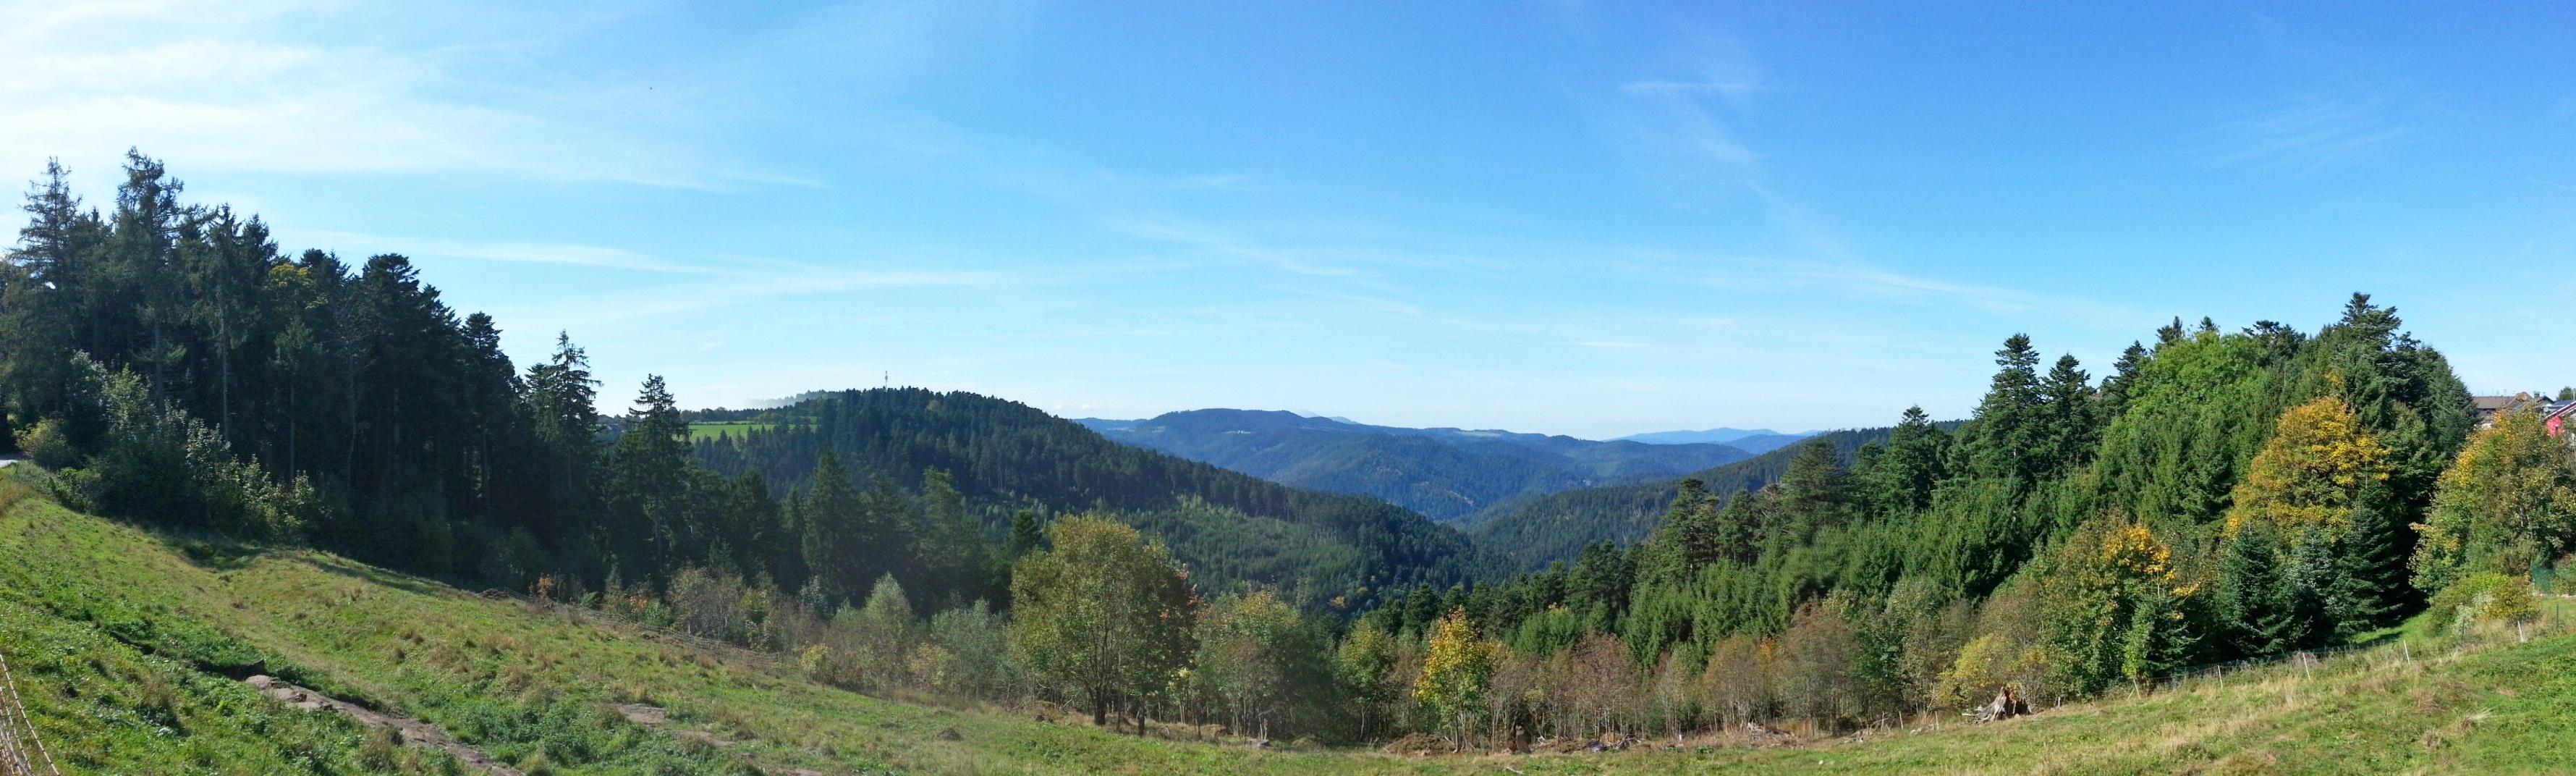 Panorama bei Aichhalden